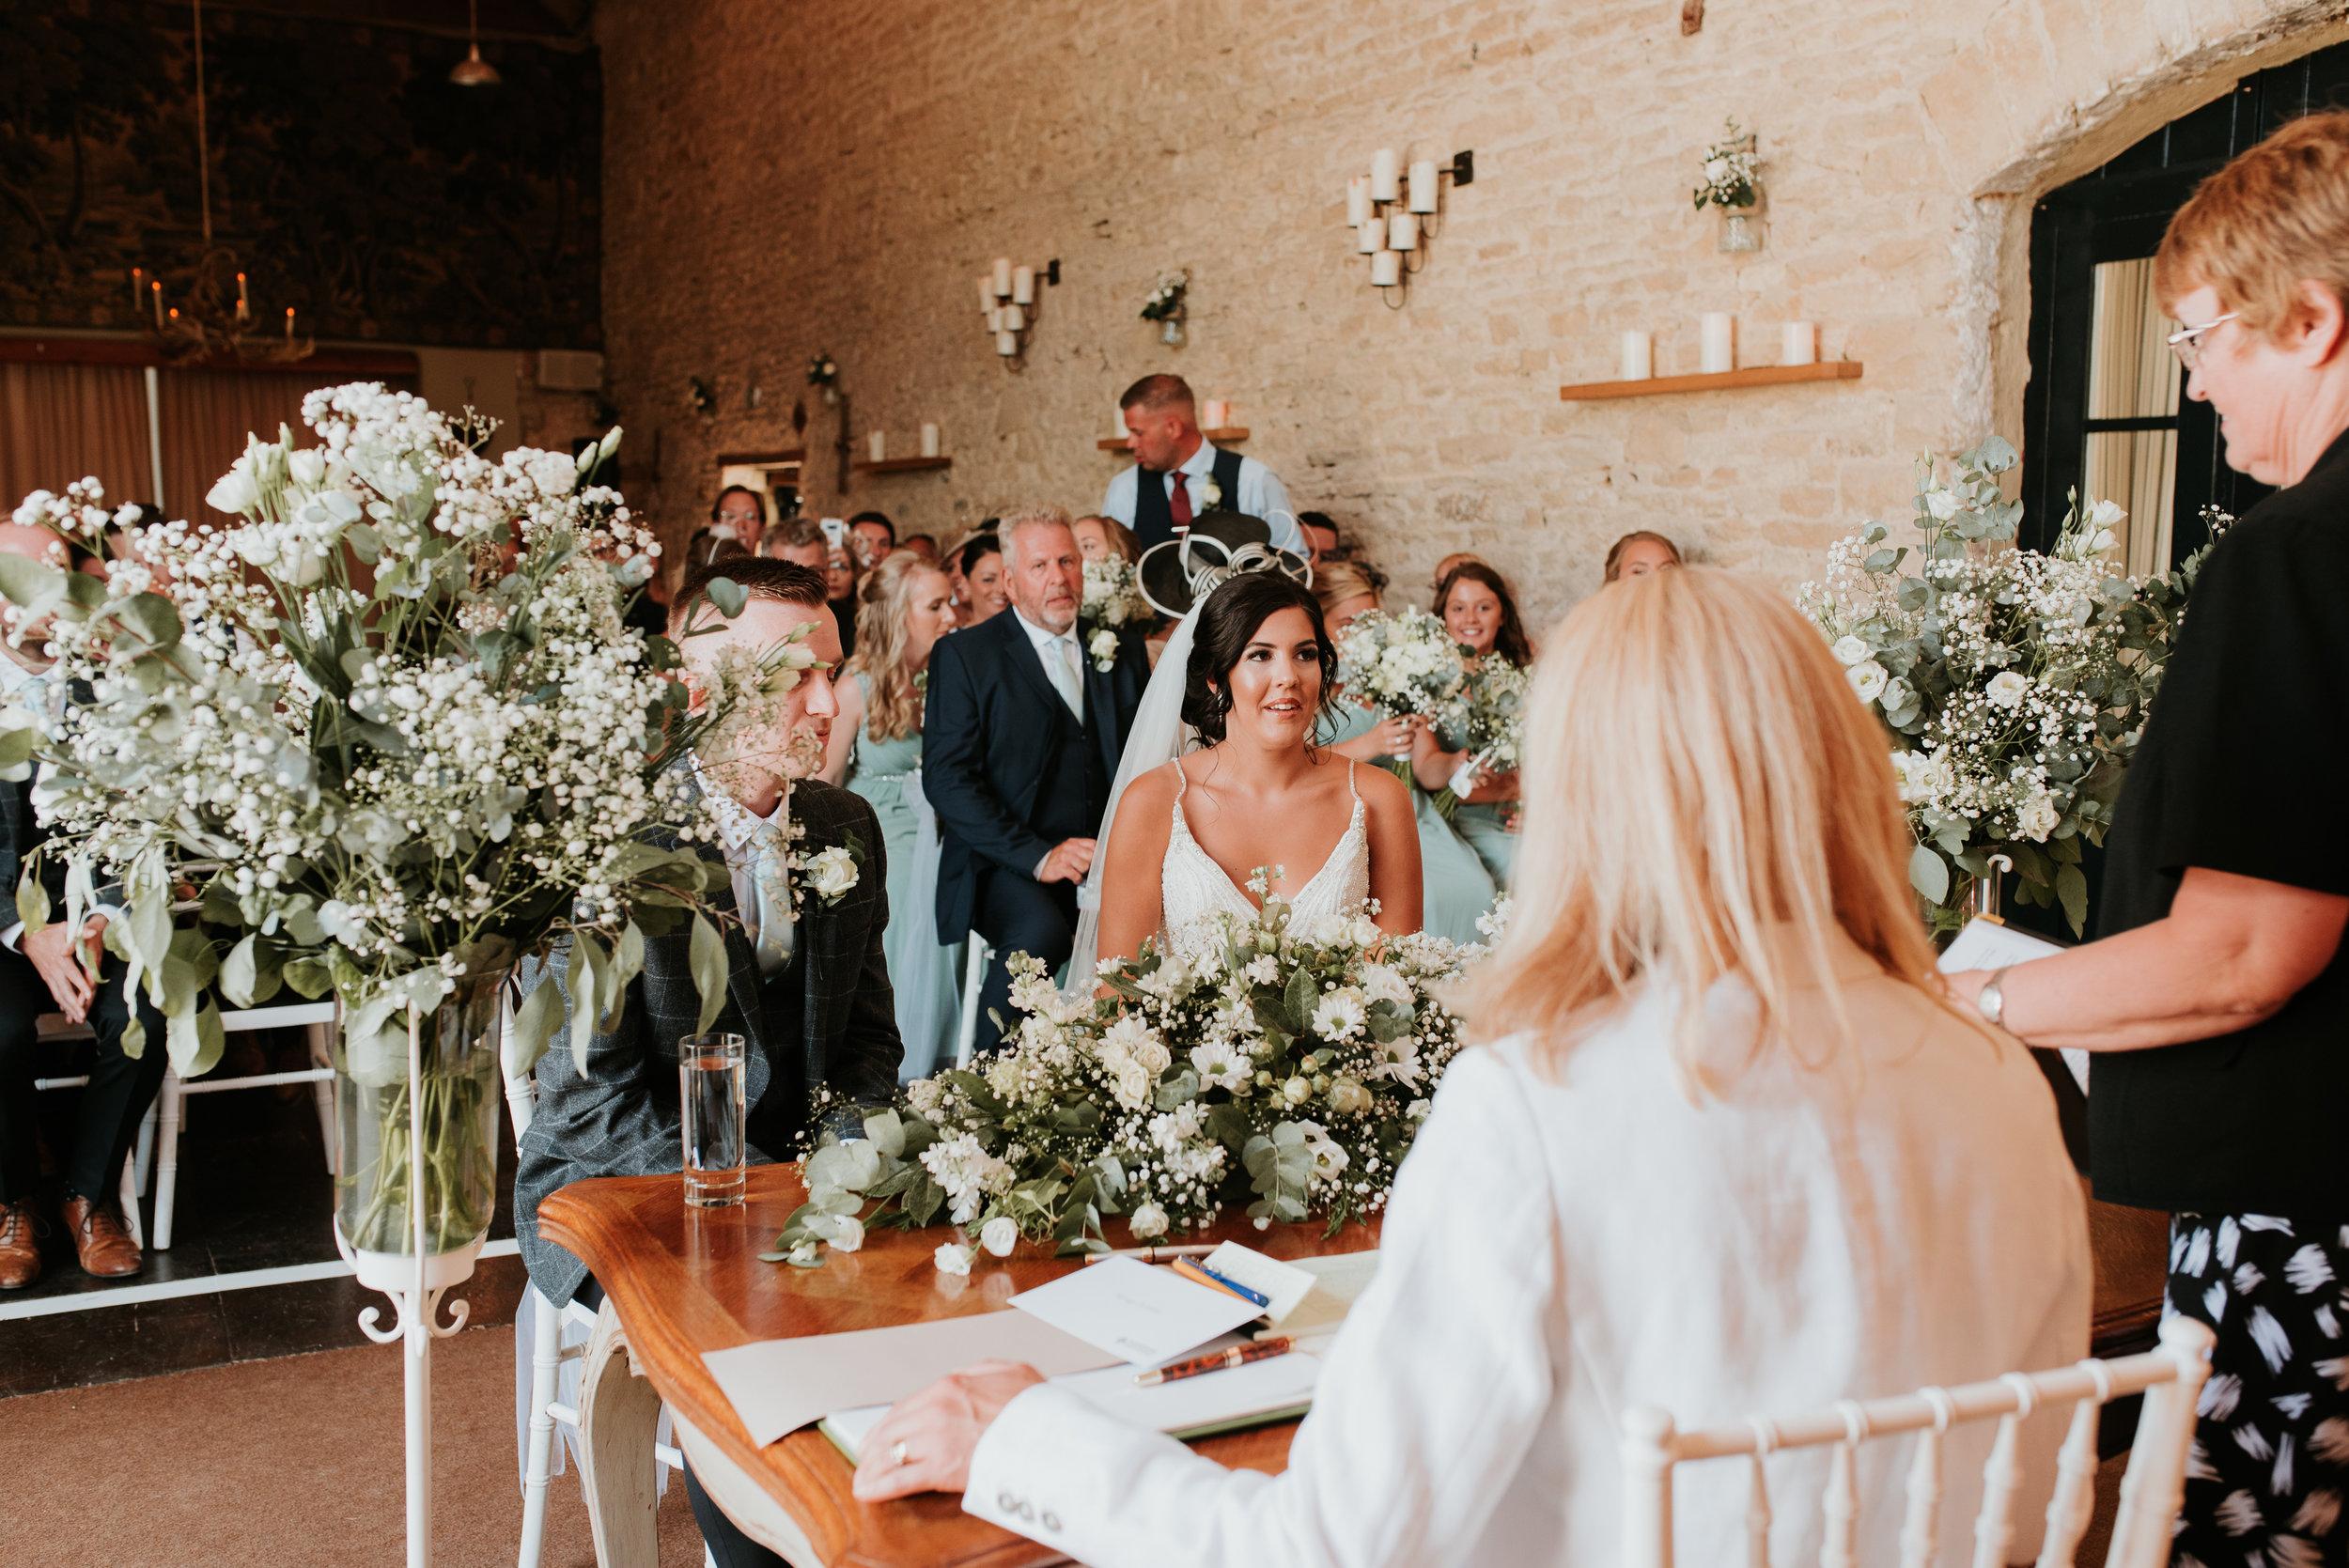 Oxfordshire-wedding-photographer-36.jpg